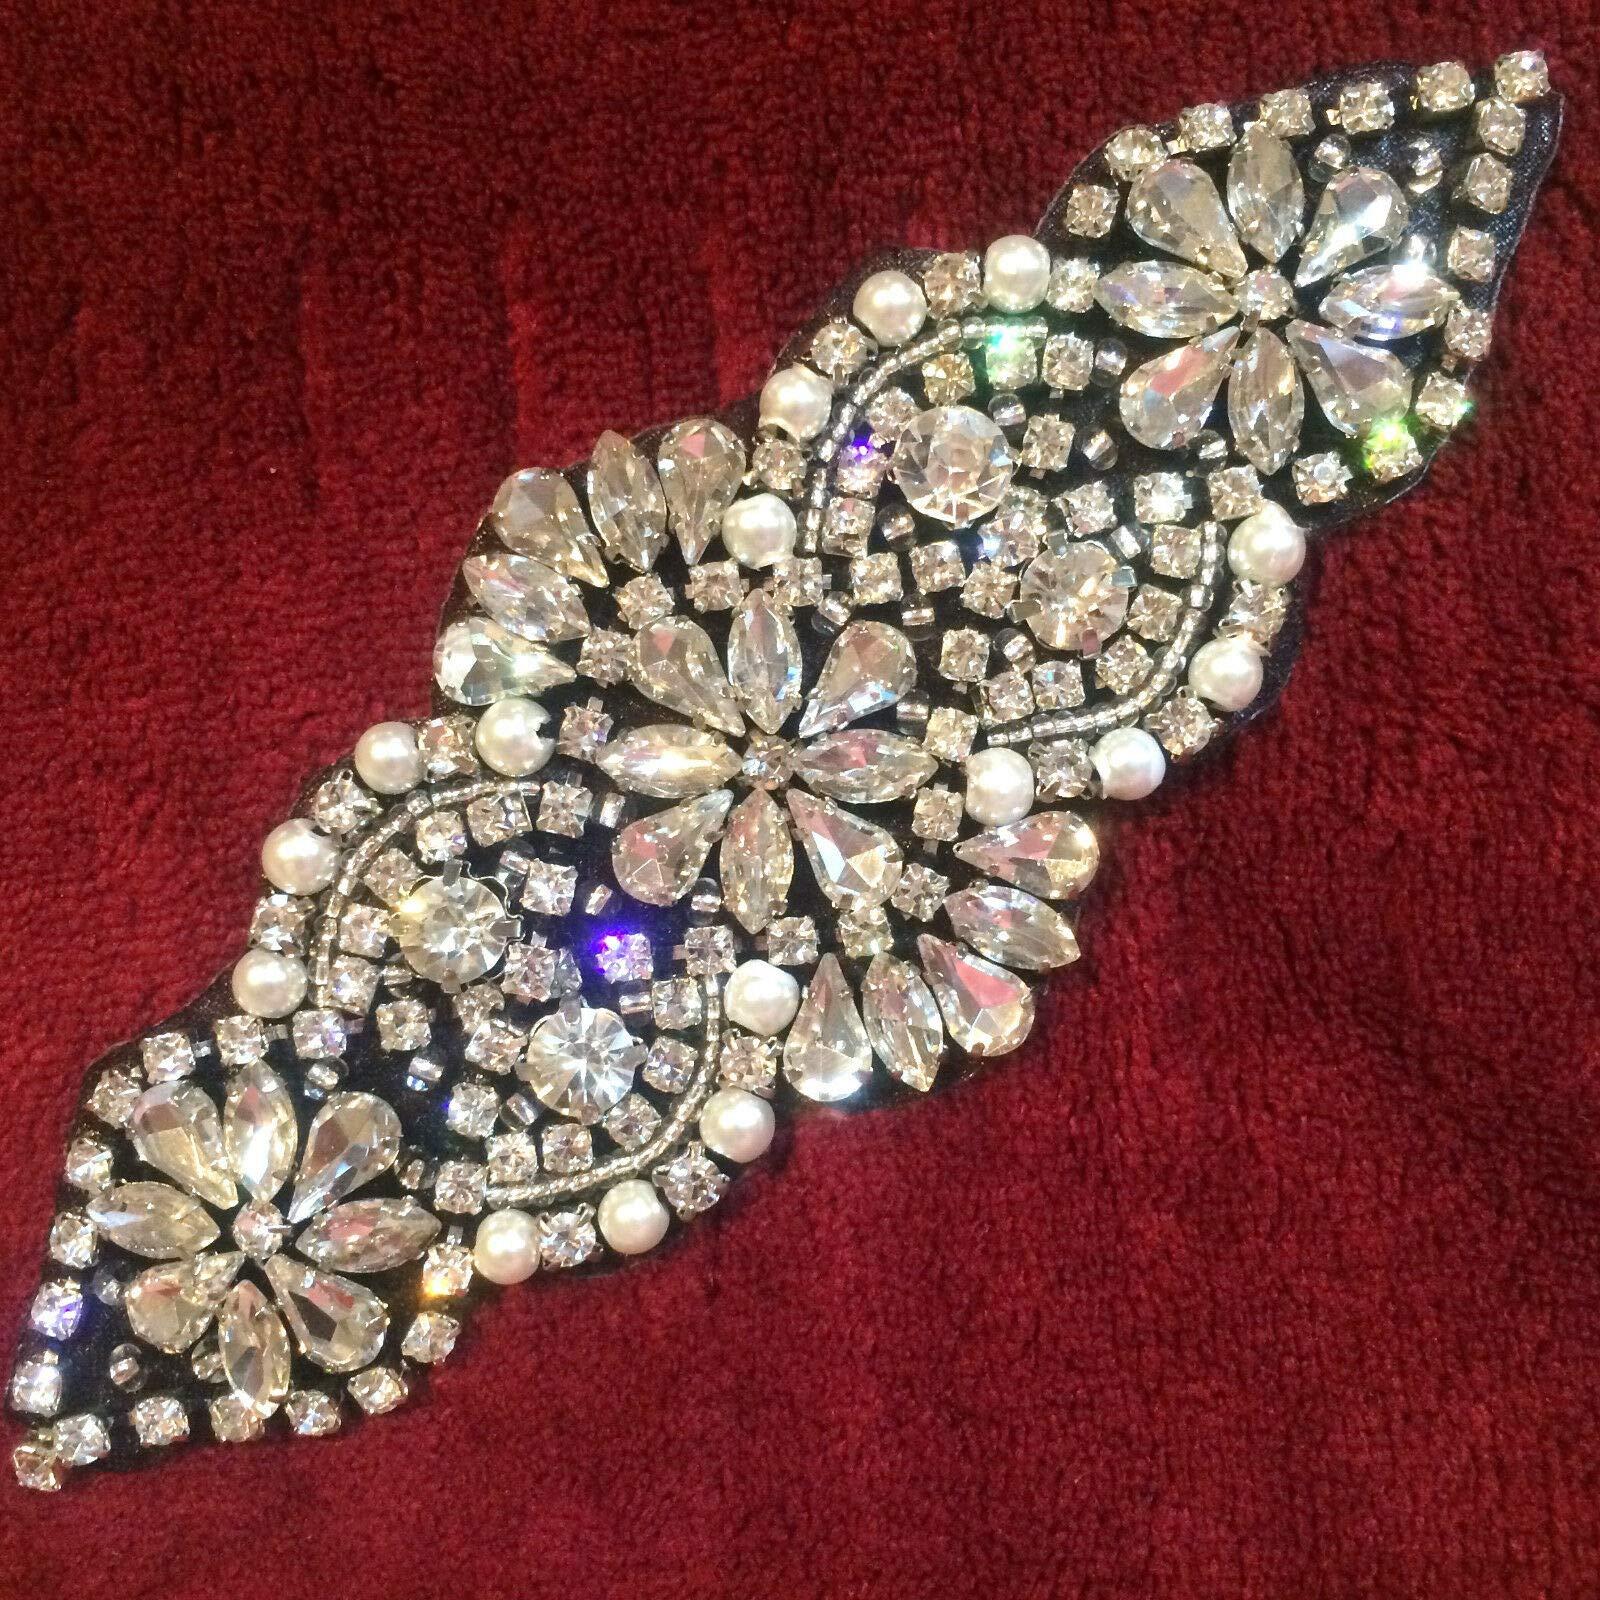 XR250 Bridal Applique Crystal Rhinestones Silver Beads Black Backing w Pearls 6'' by GL Appliques